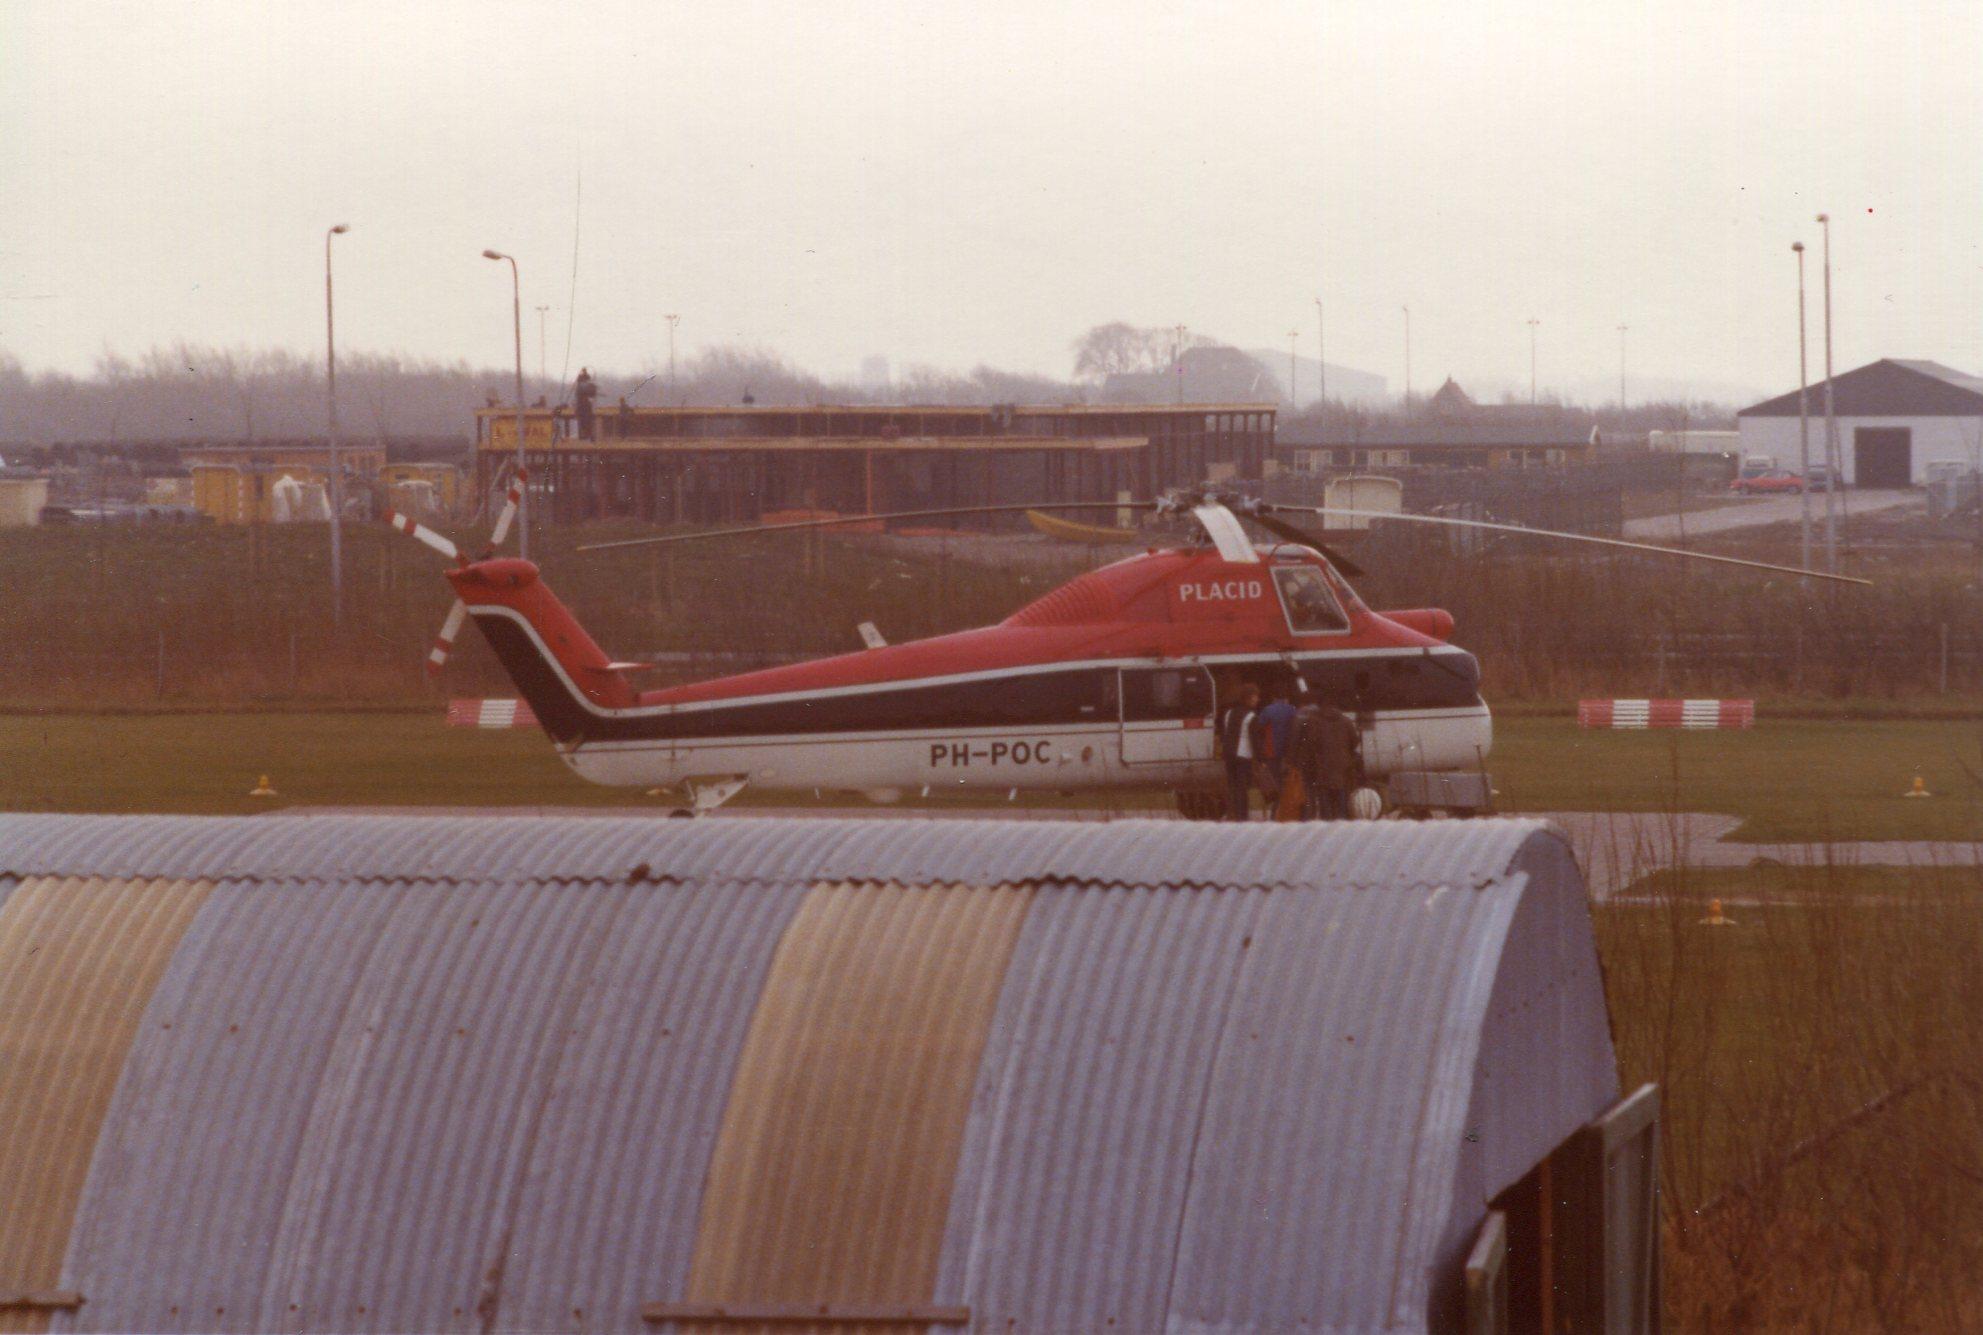 Naam: Den Helder , april 1977 (2).jpg Bekeken: 211 Grootte: 271,9 KB